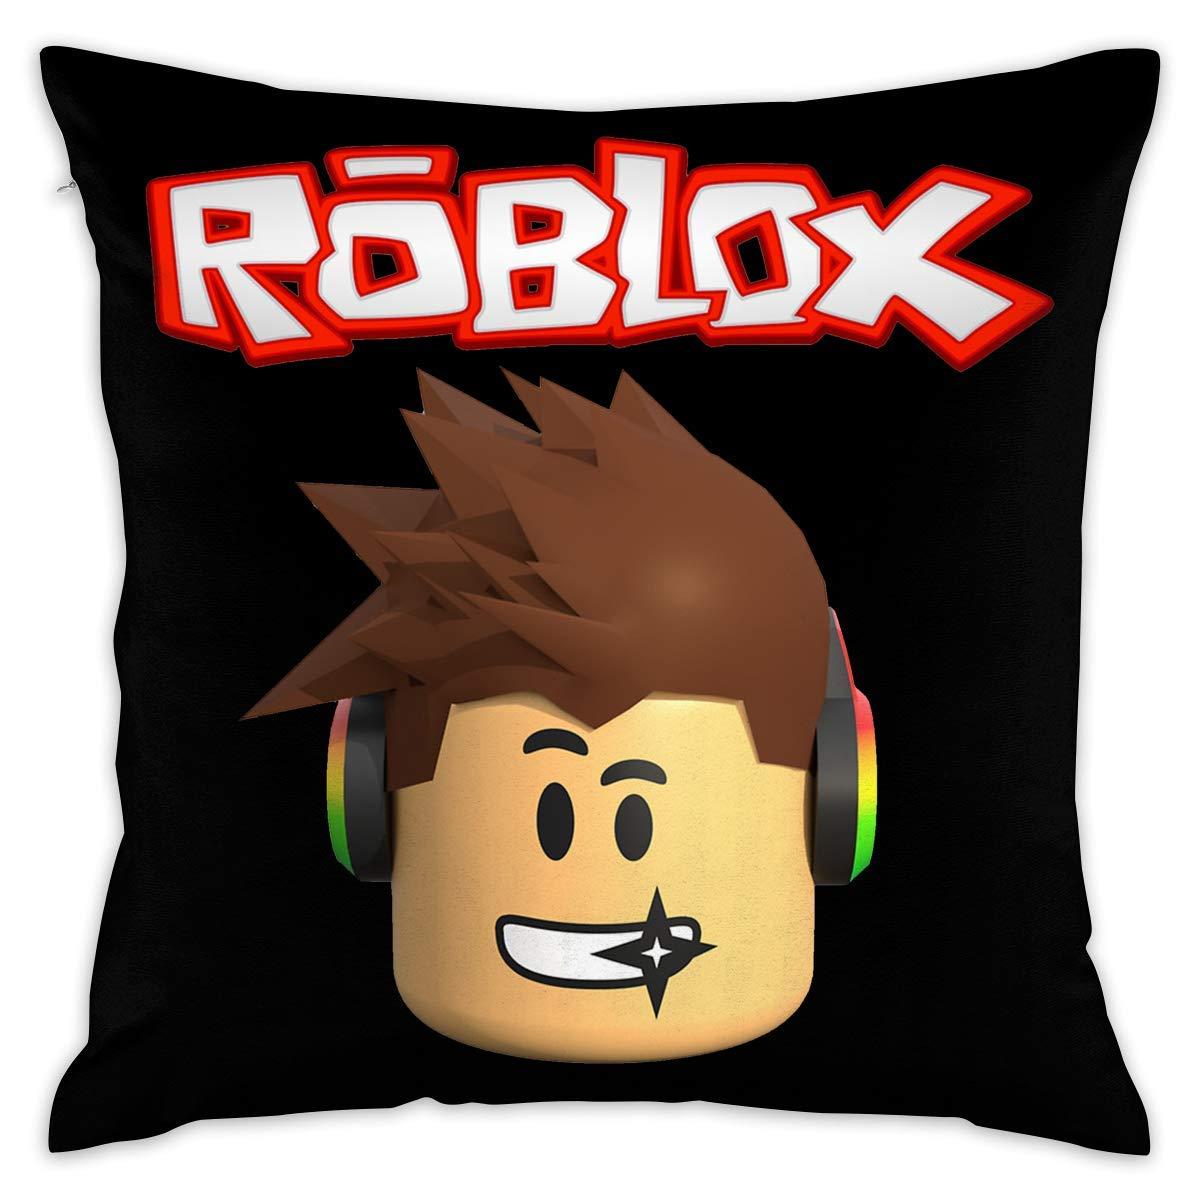 SWARON Roblox Character Head Video Game Graphic Decorative Lumbar Pillow Covers Case Pillowcases Fundas para Almohada (45cmx45cm)